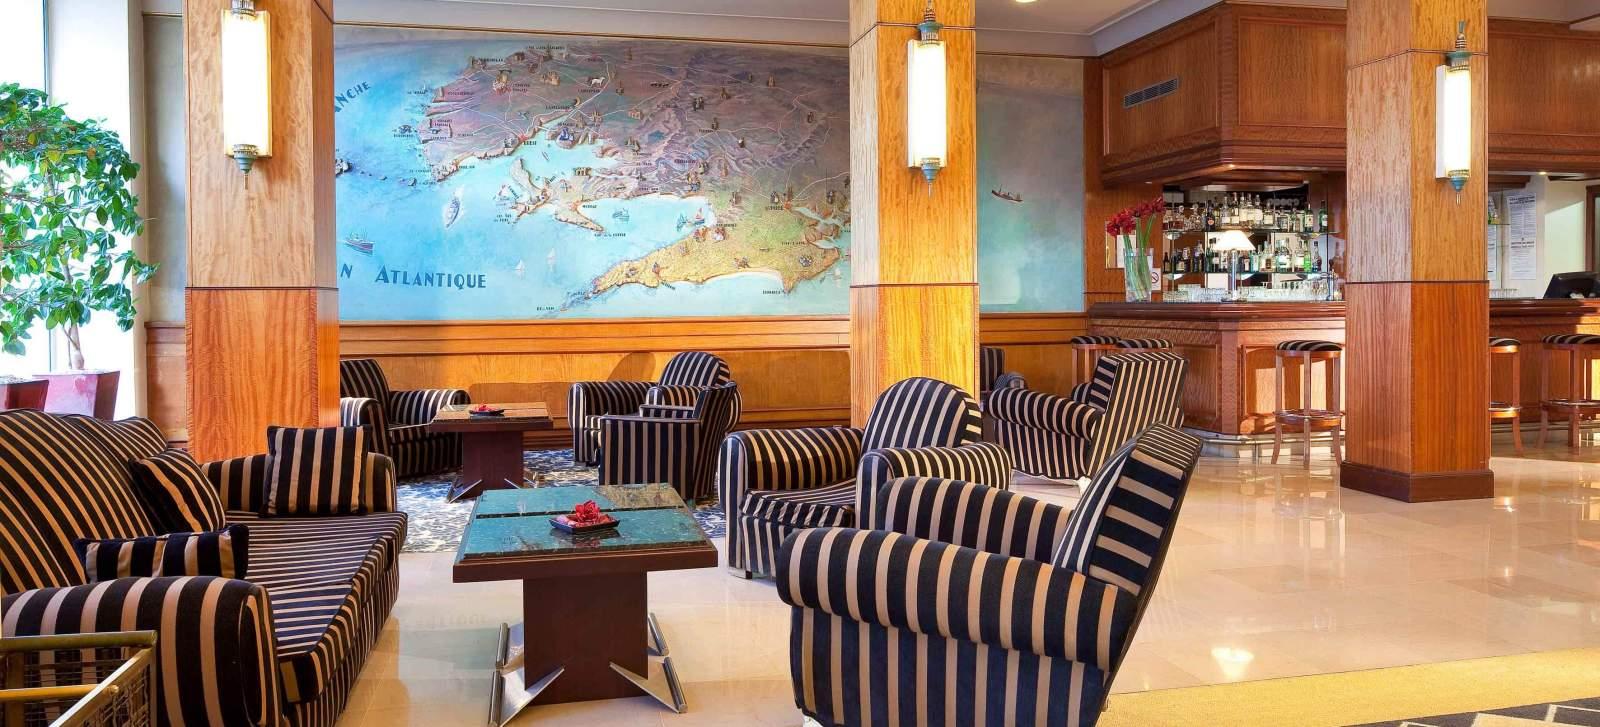 Lobby - Hôtel Le Continental Brest 4 étoiles.jpg